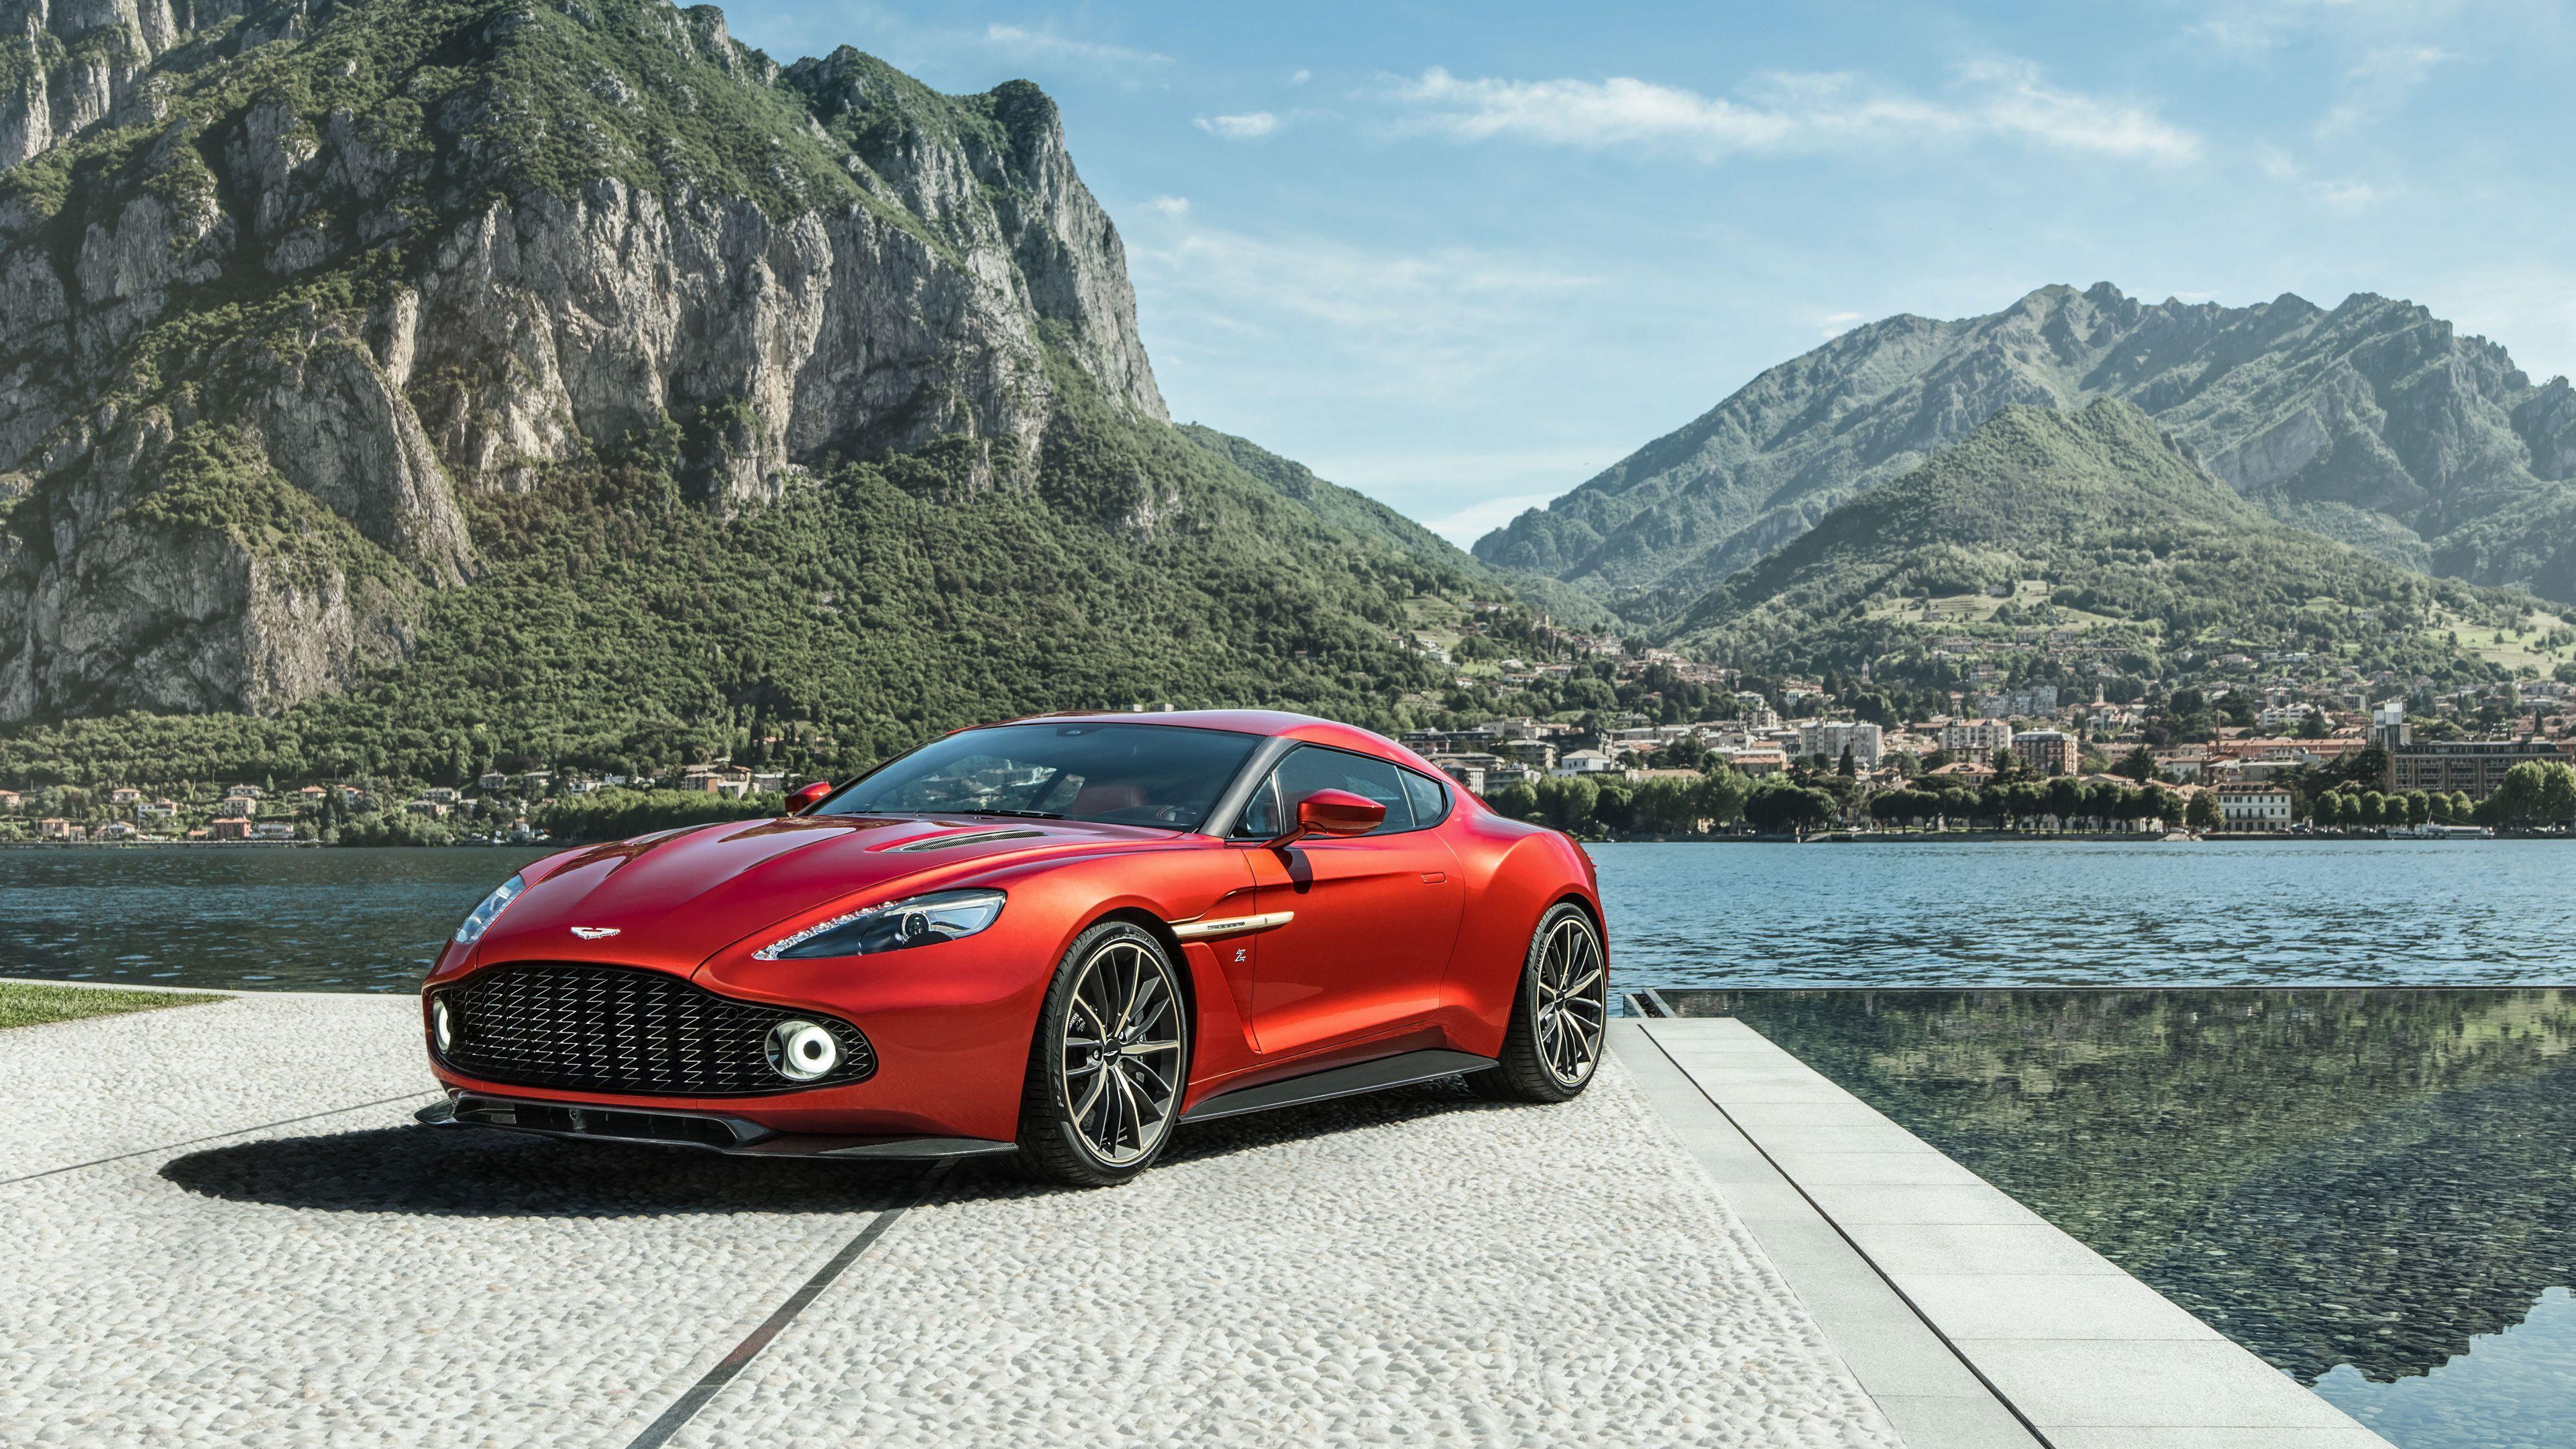 Aston Martin Wallpapers Top Free Aston Martin Backgrounds